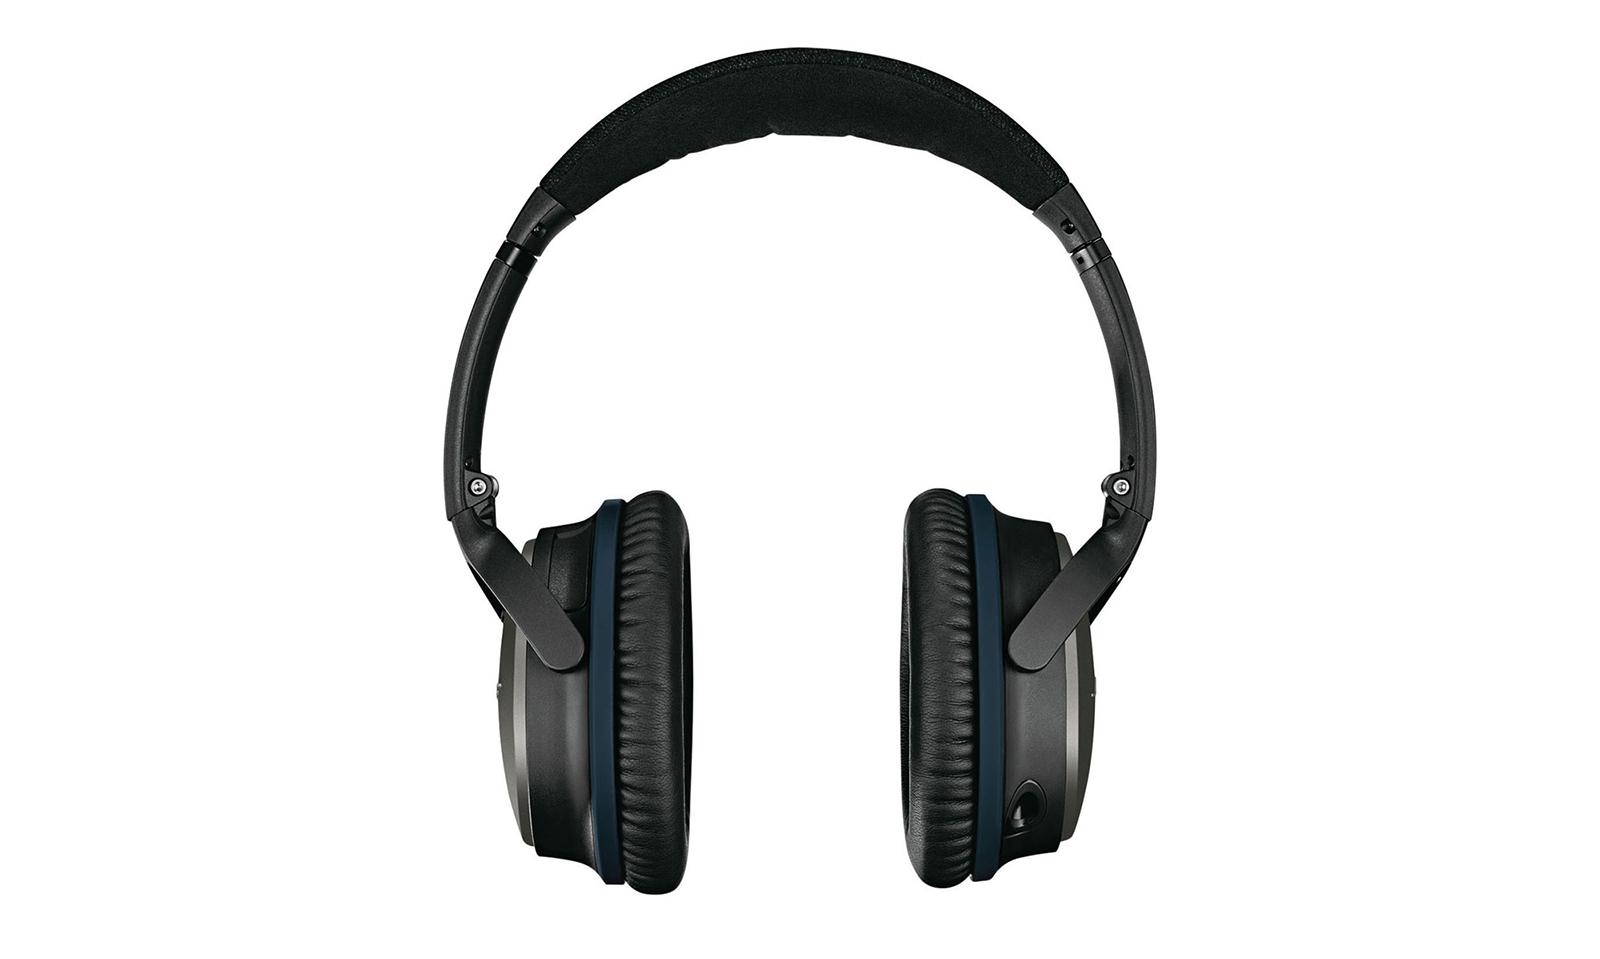 fd1f098b0f1 Wirecutter's best deals: Save $130 on Bose QuietComfort 25 headphones